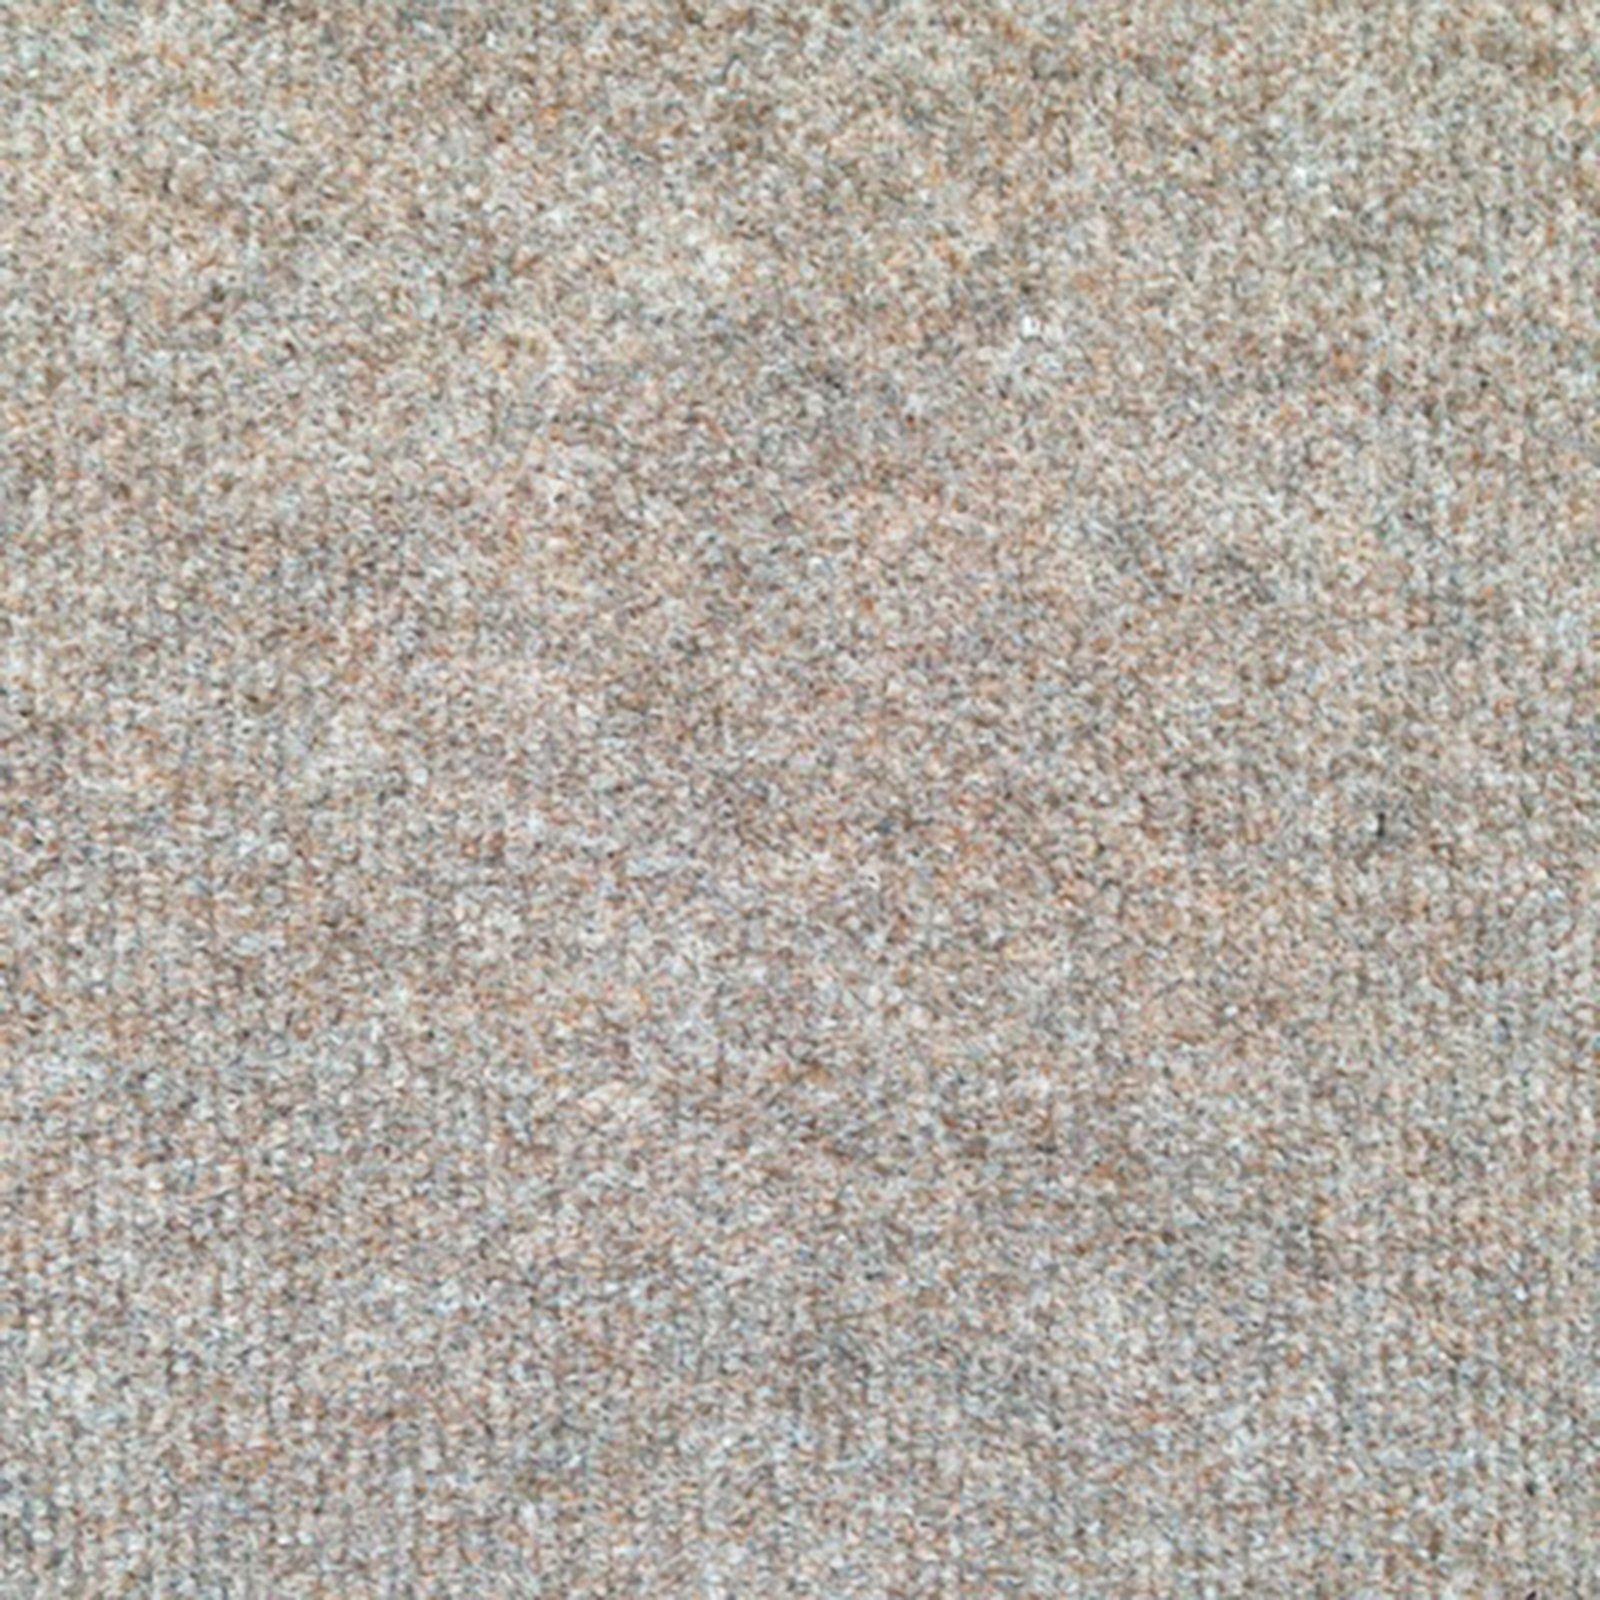 teppichboden star beige 2 meter breit teppichboden bodenbel ge renovieren roller. Black Bedroom Furniture Sets. Home Design Ideas